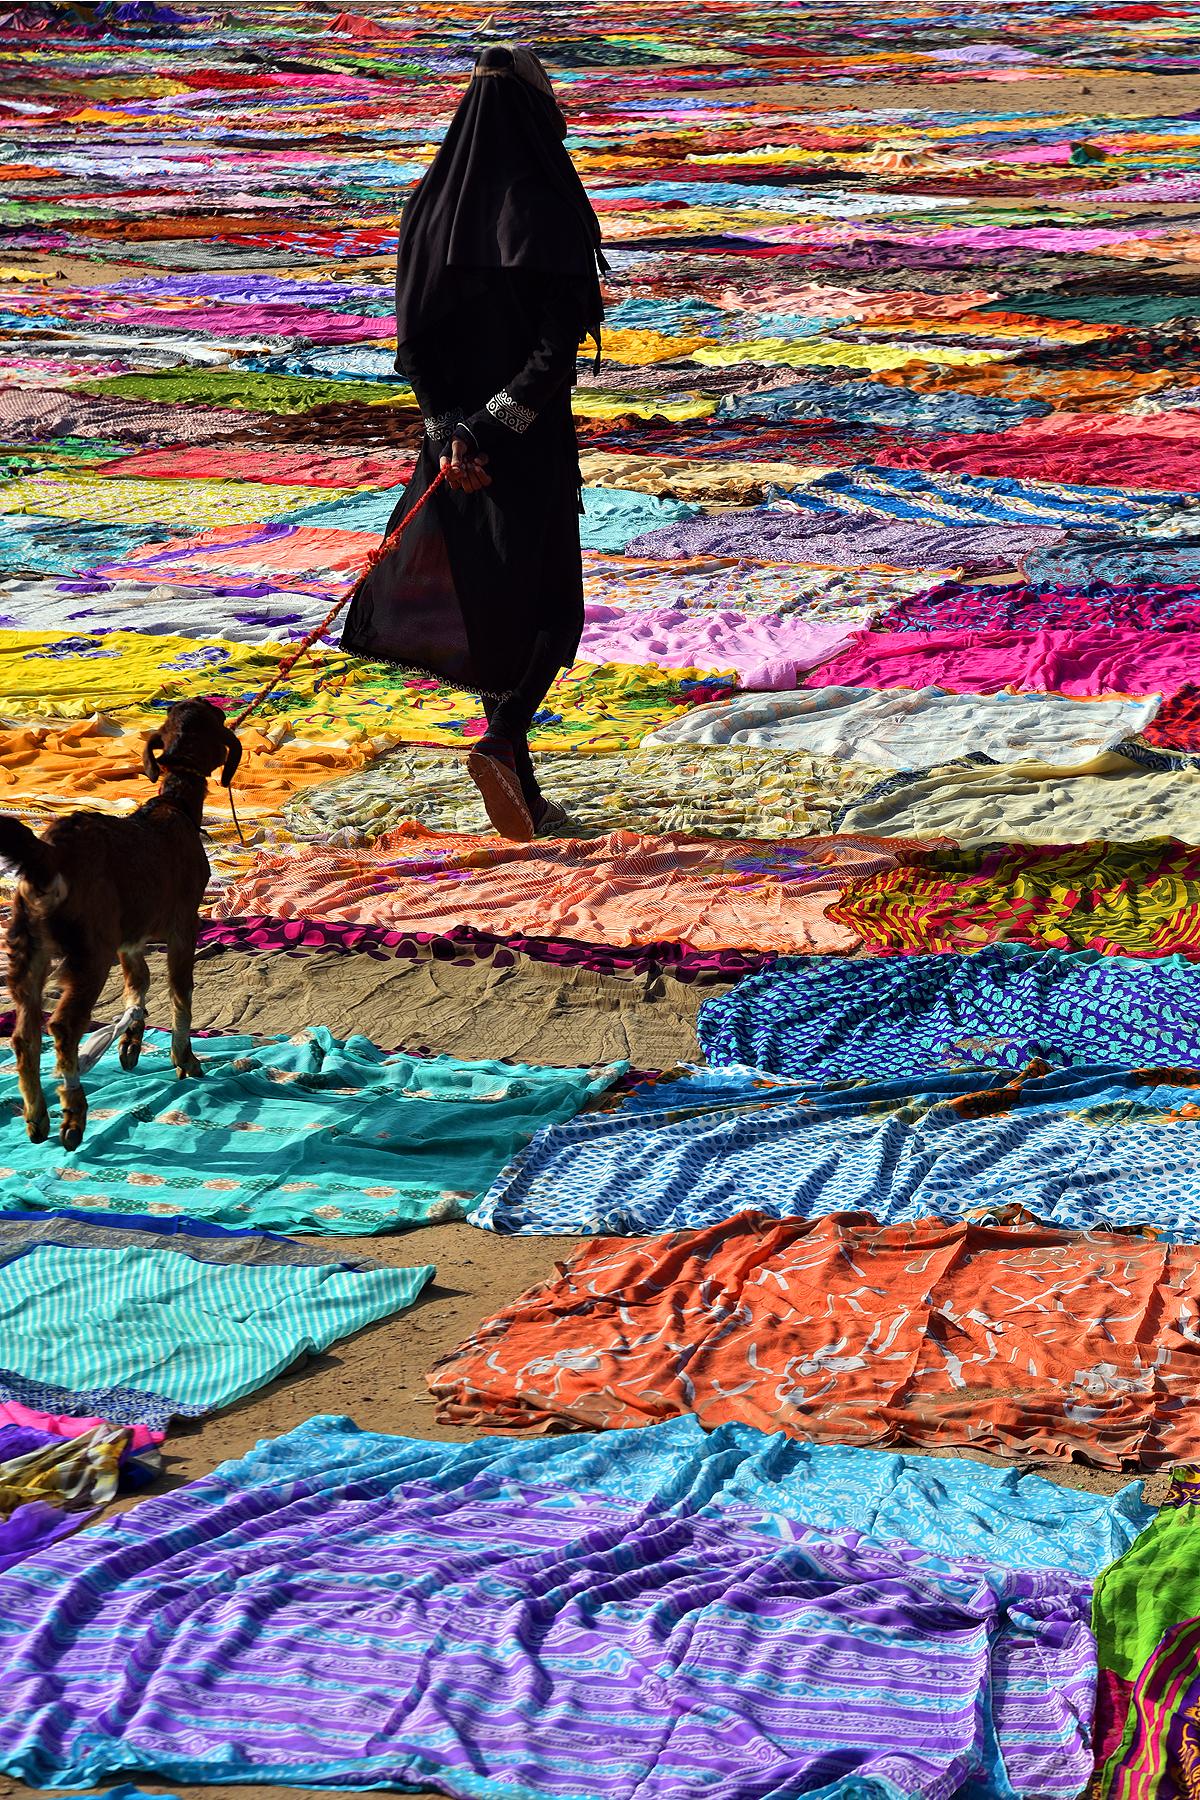 aken from agra dobhi ghut  hen walkin a lady wih her goat though the colourefull dresses ...i felt its like a clourfull deam r a sean in my grandmothers story